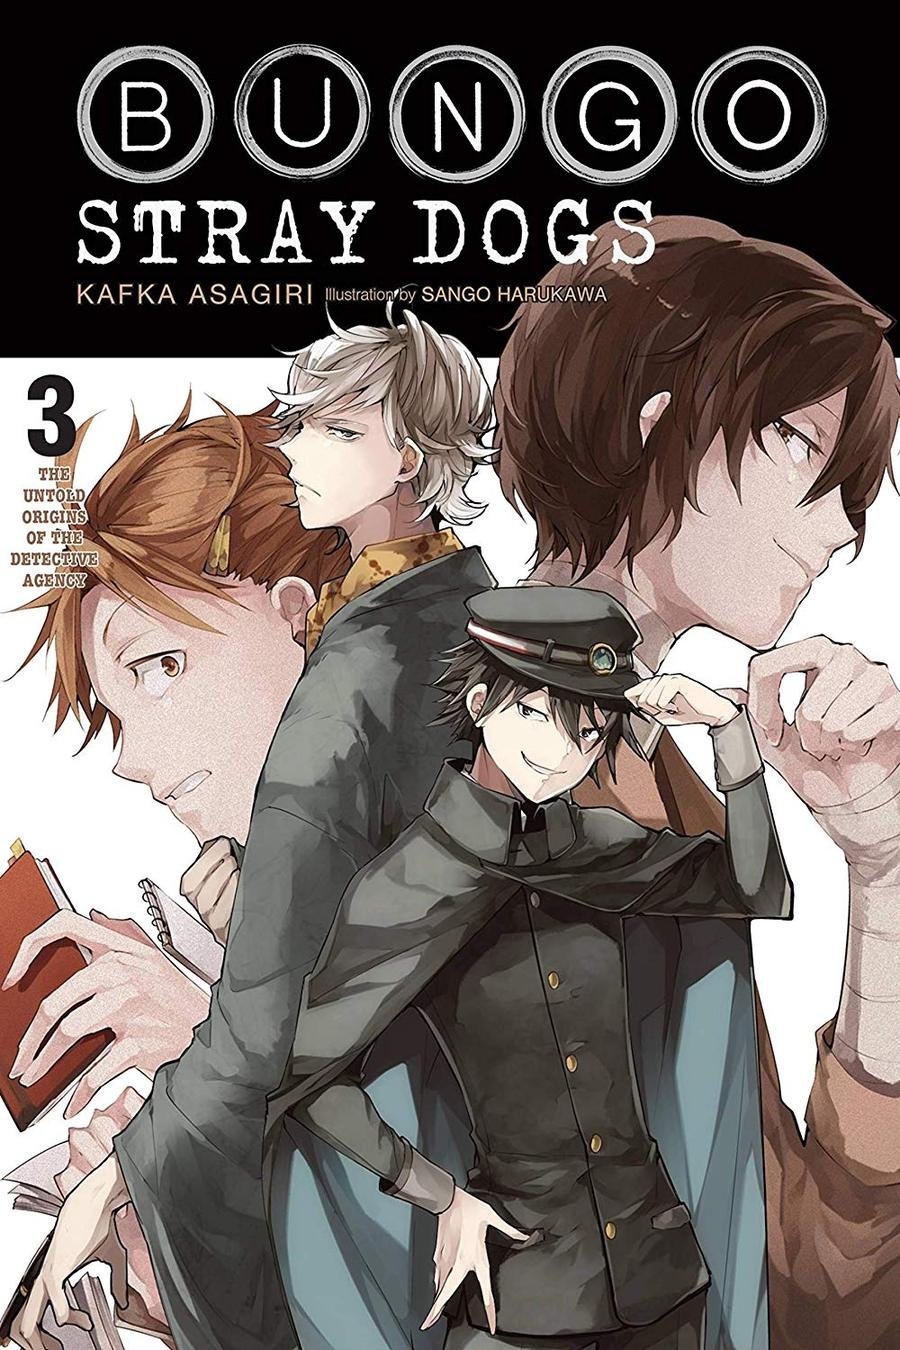 Bungo Stray Dogs Light Novel Vol 3 Untold Origins Agency